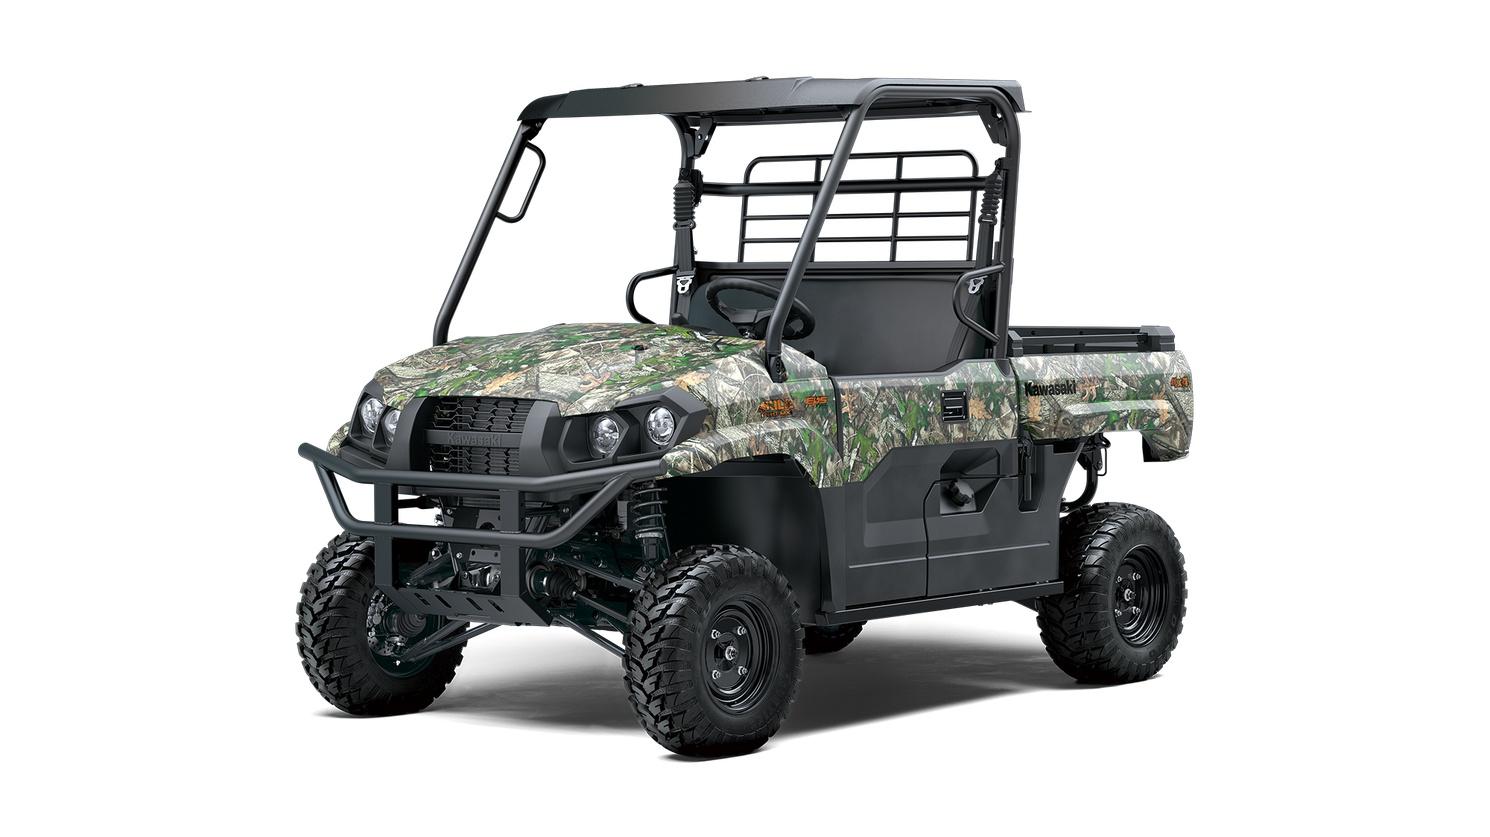 2021 Kawasaki MULE PRO-MX EPS CAMO Camouflage Truetimber Htc Green